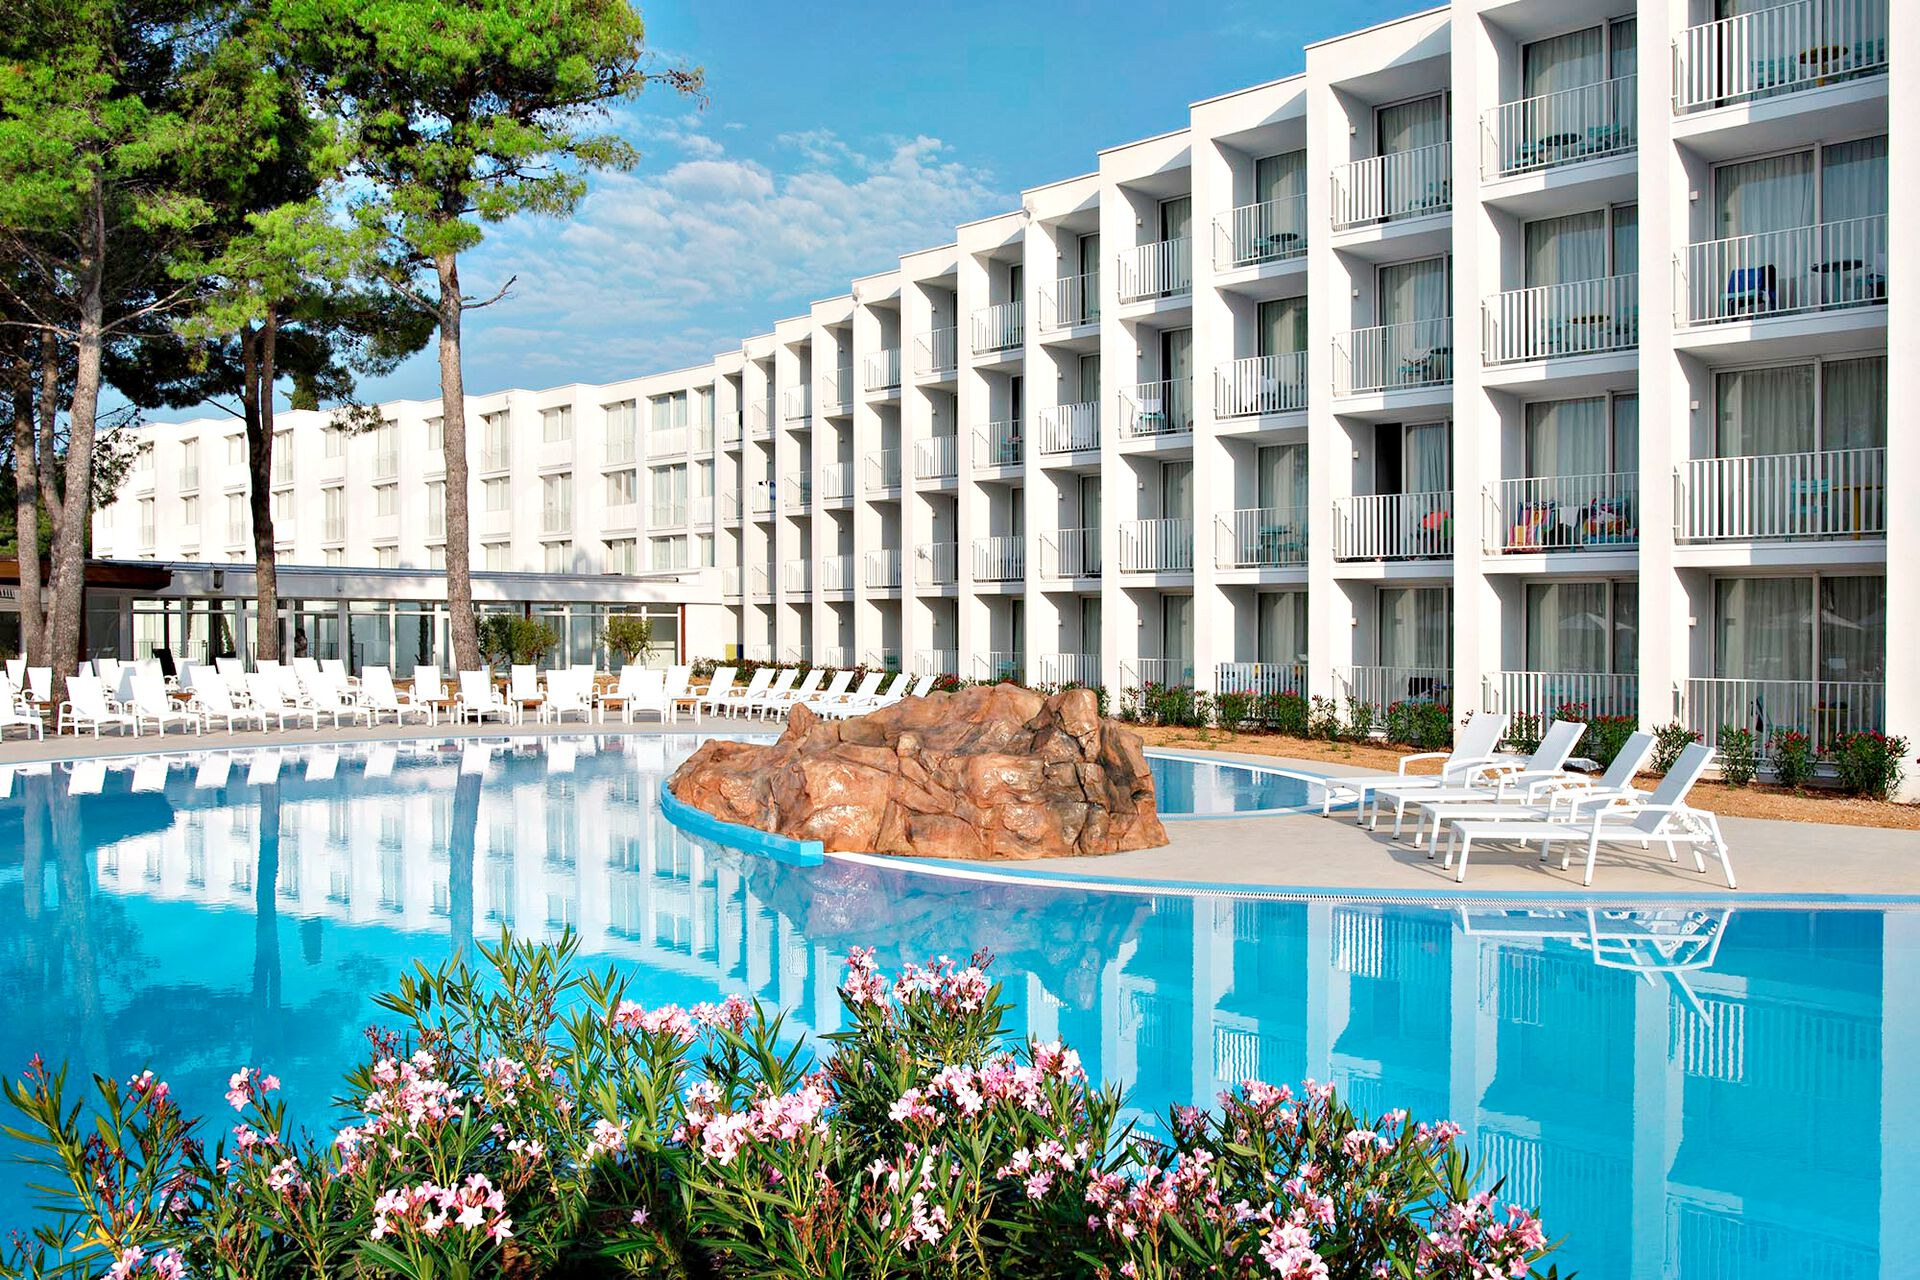 Croatie - Amadria Park - Hôtel Jakov 4*